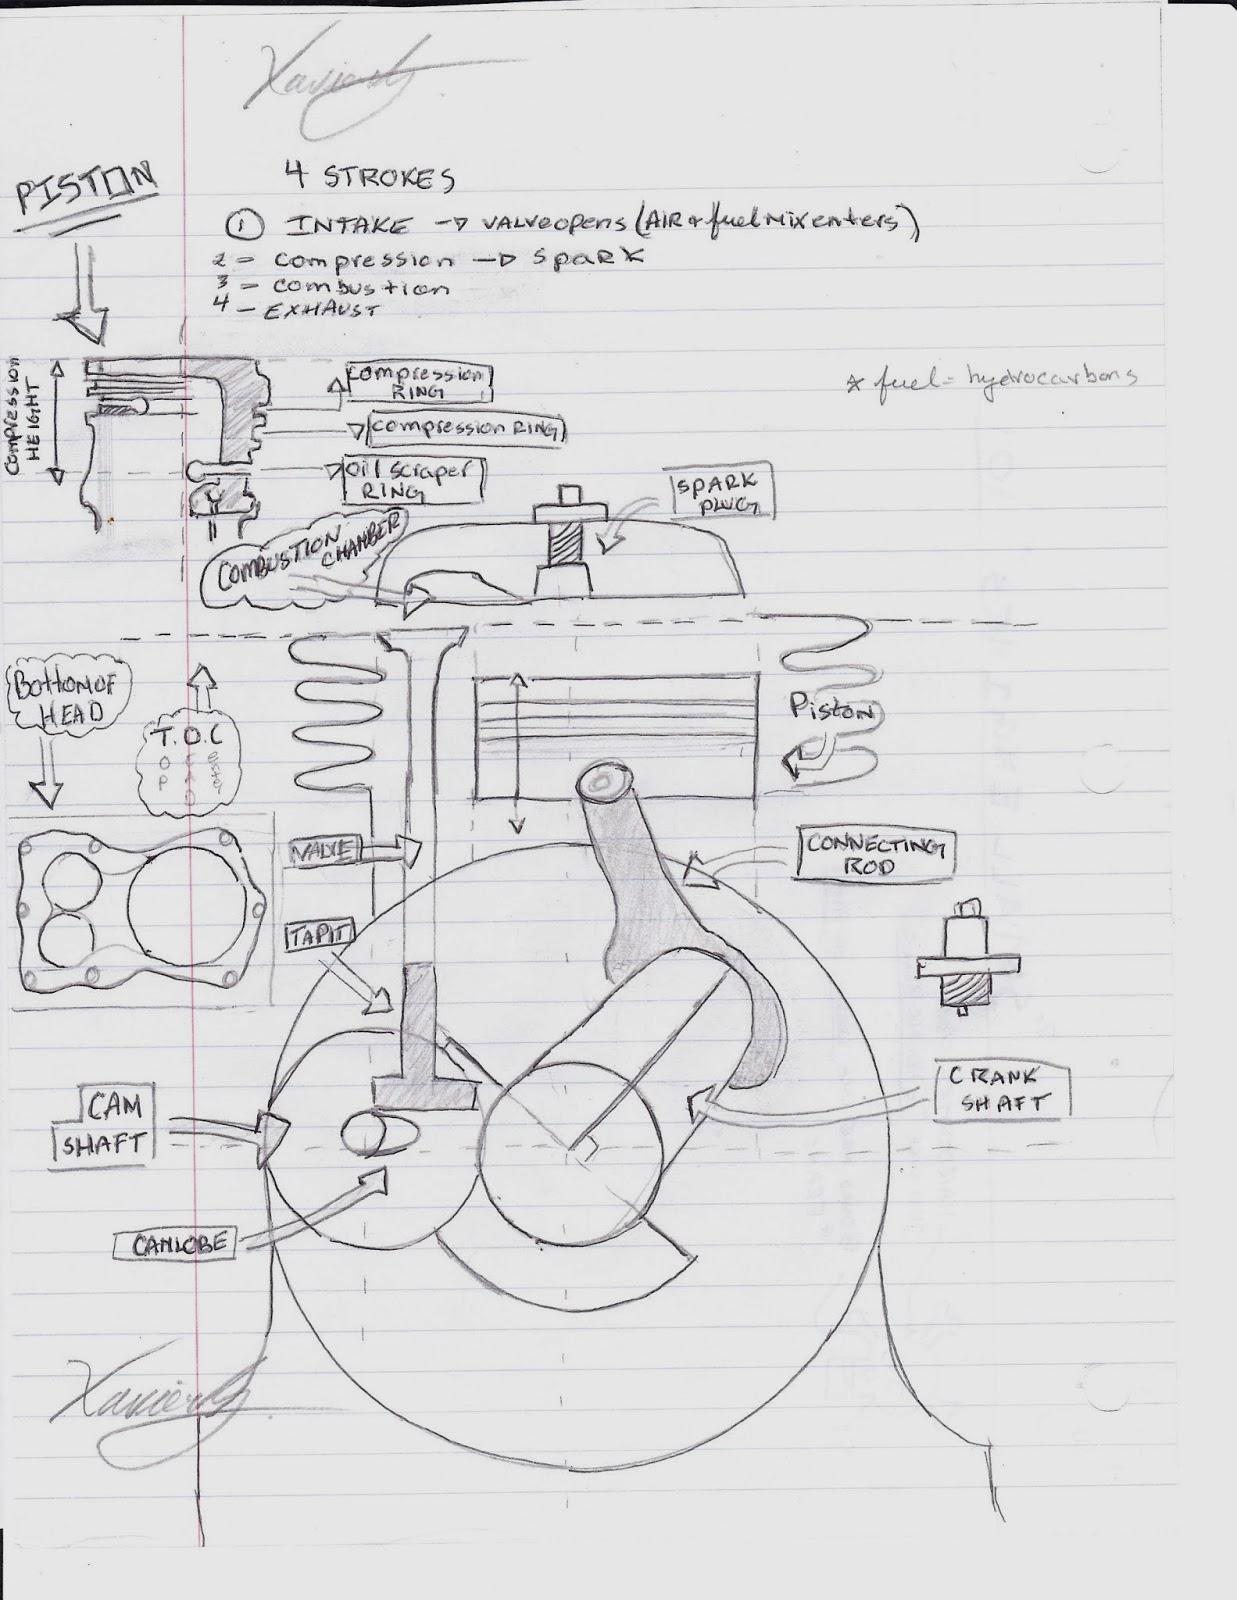 engine diagram (drawn) small engine 101